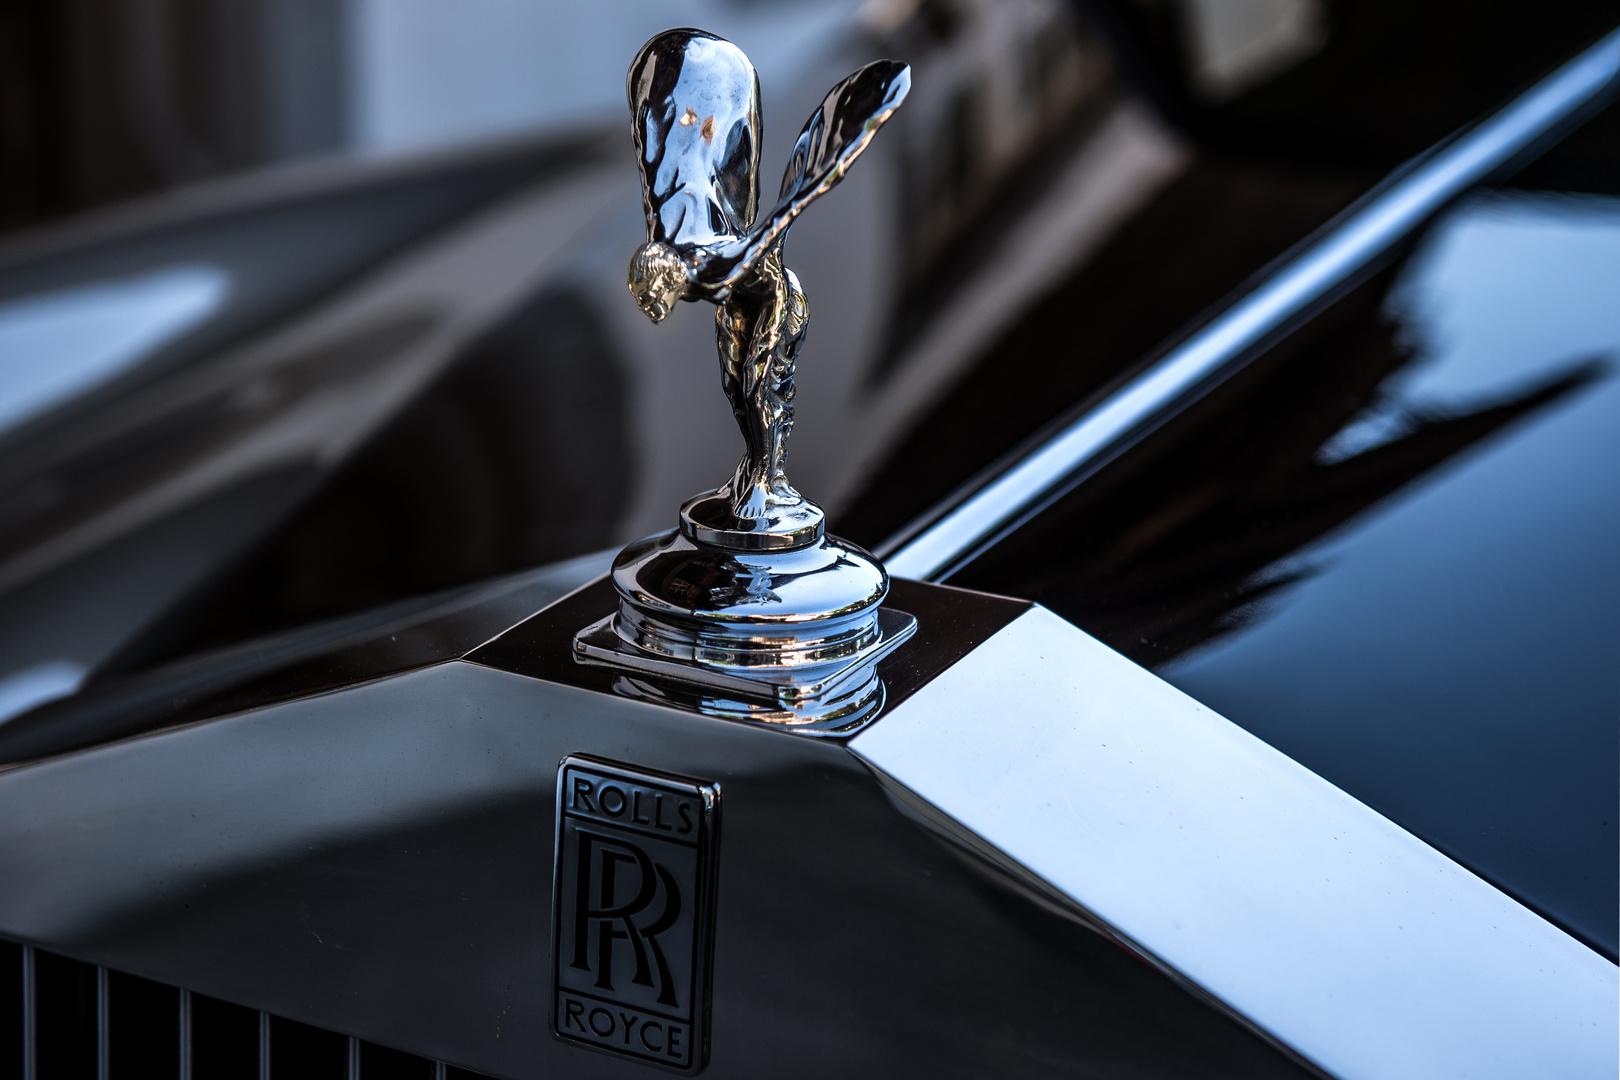 Rolls-Royce-Kühlerfigur / Spirit of Ecstasy